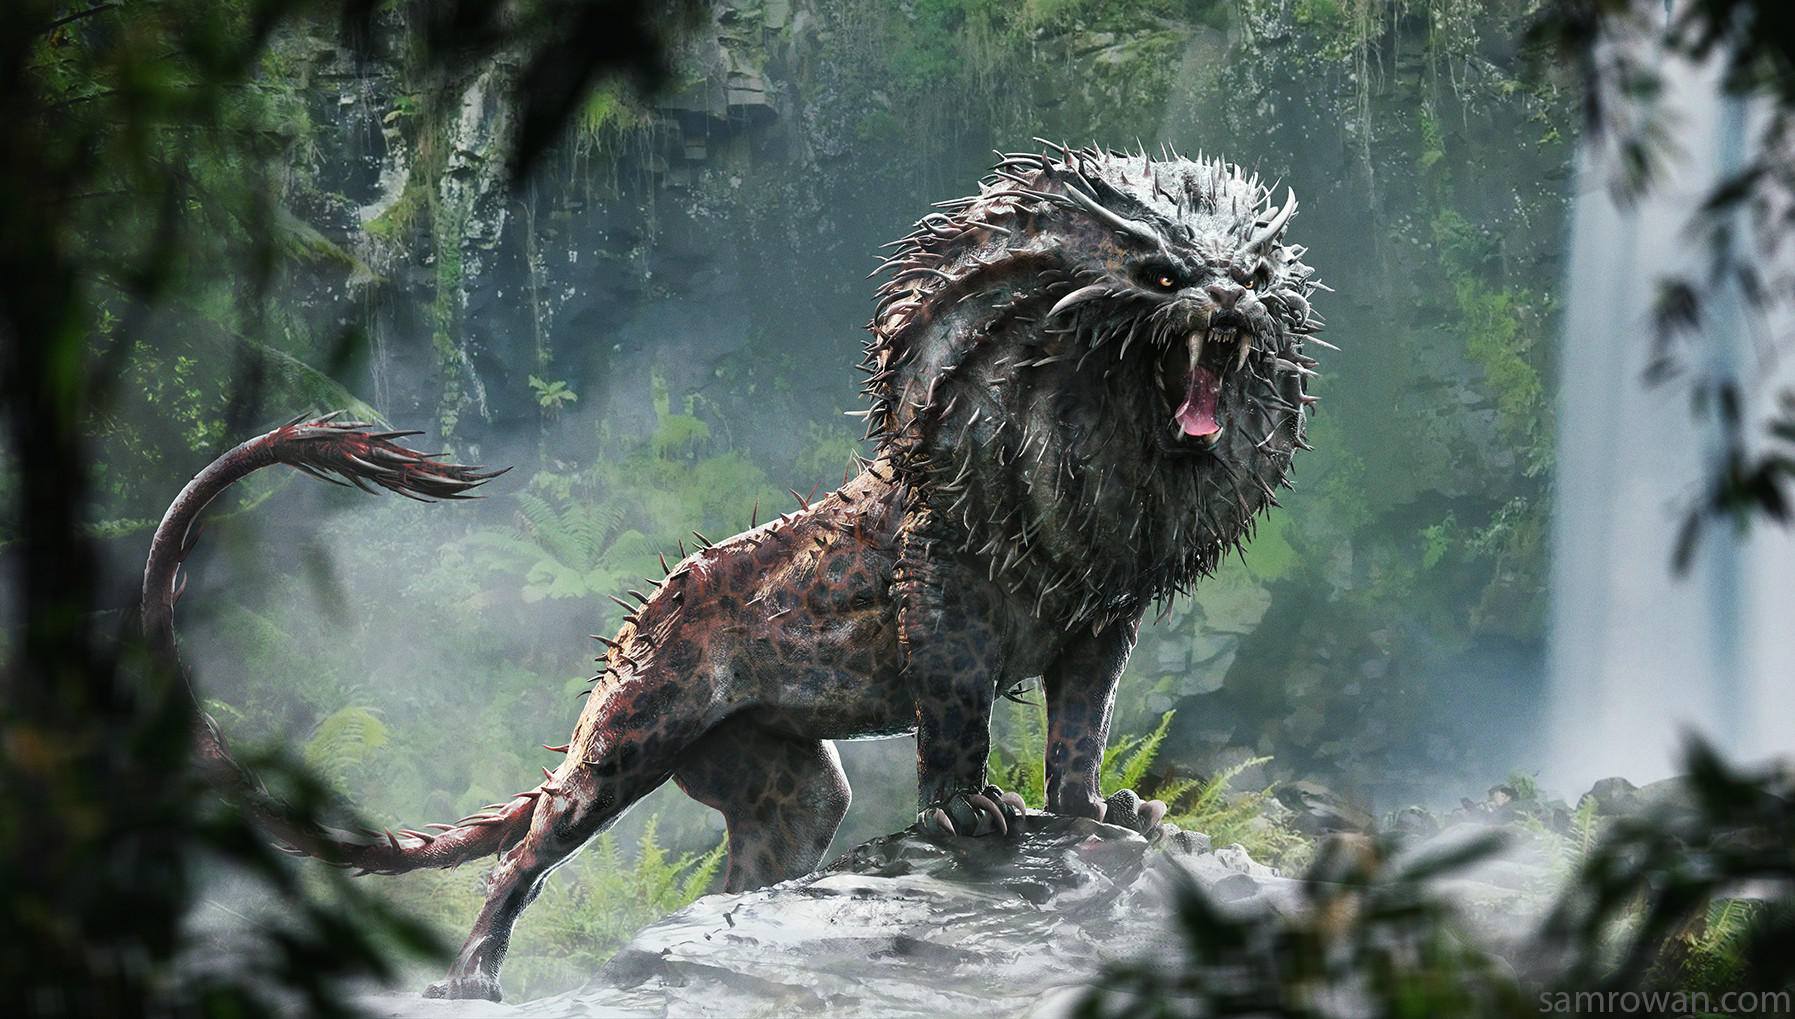 Sam Rowan The Numdu Fantastic Beasts